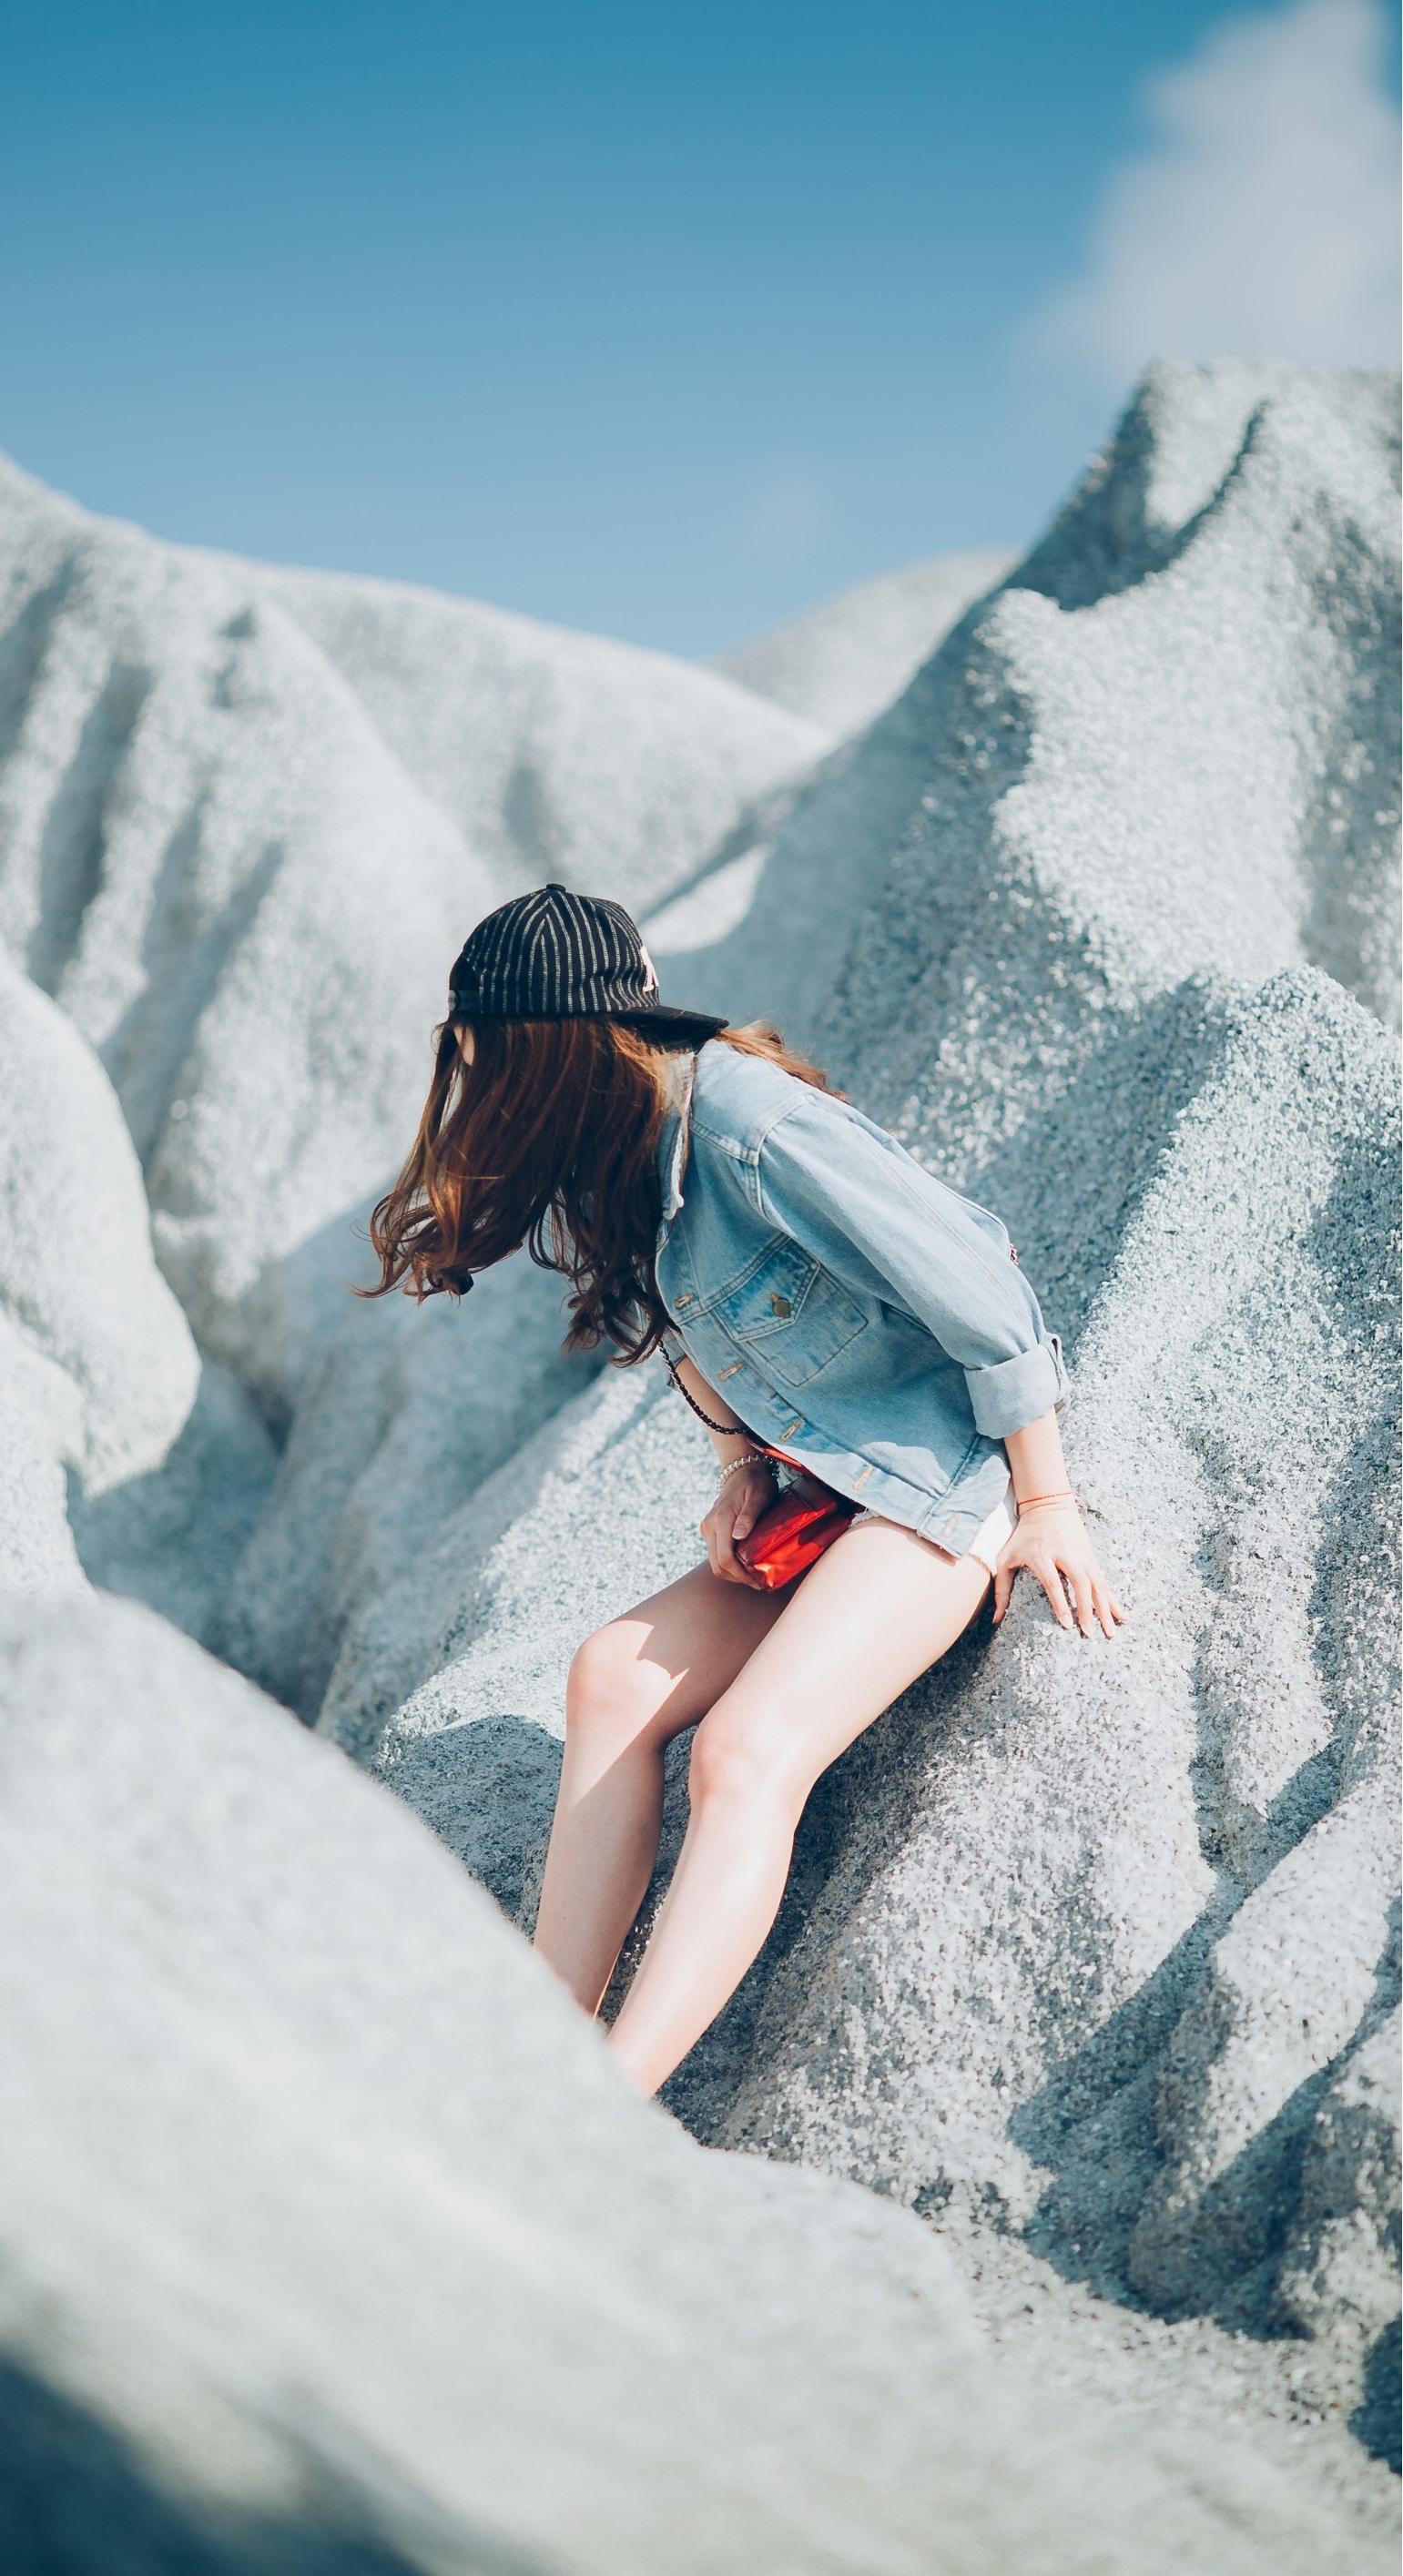 A woman in a baseball cap and denim shirt leans against sand dunes in Thailand